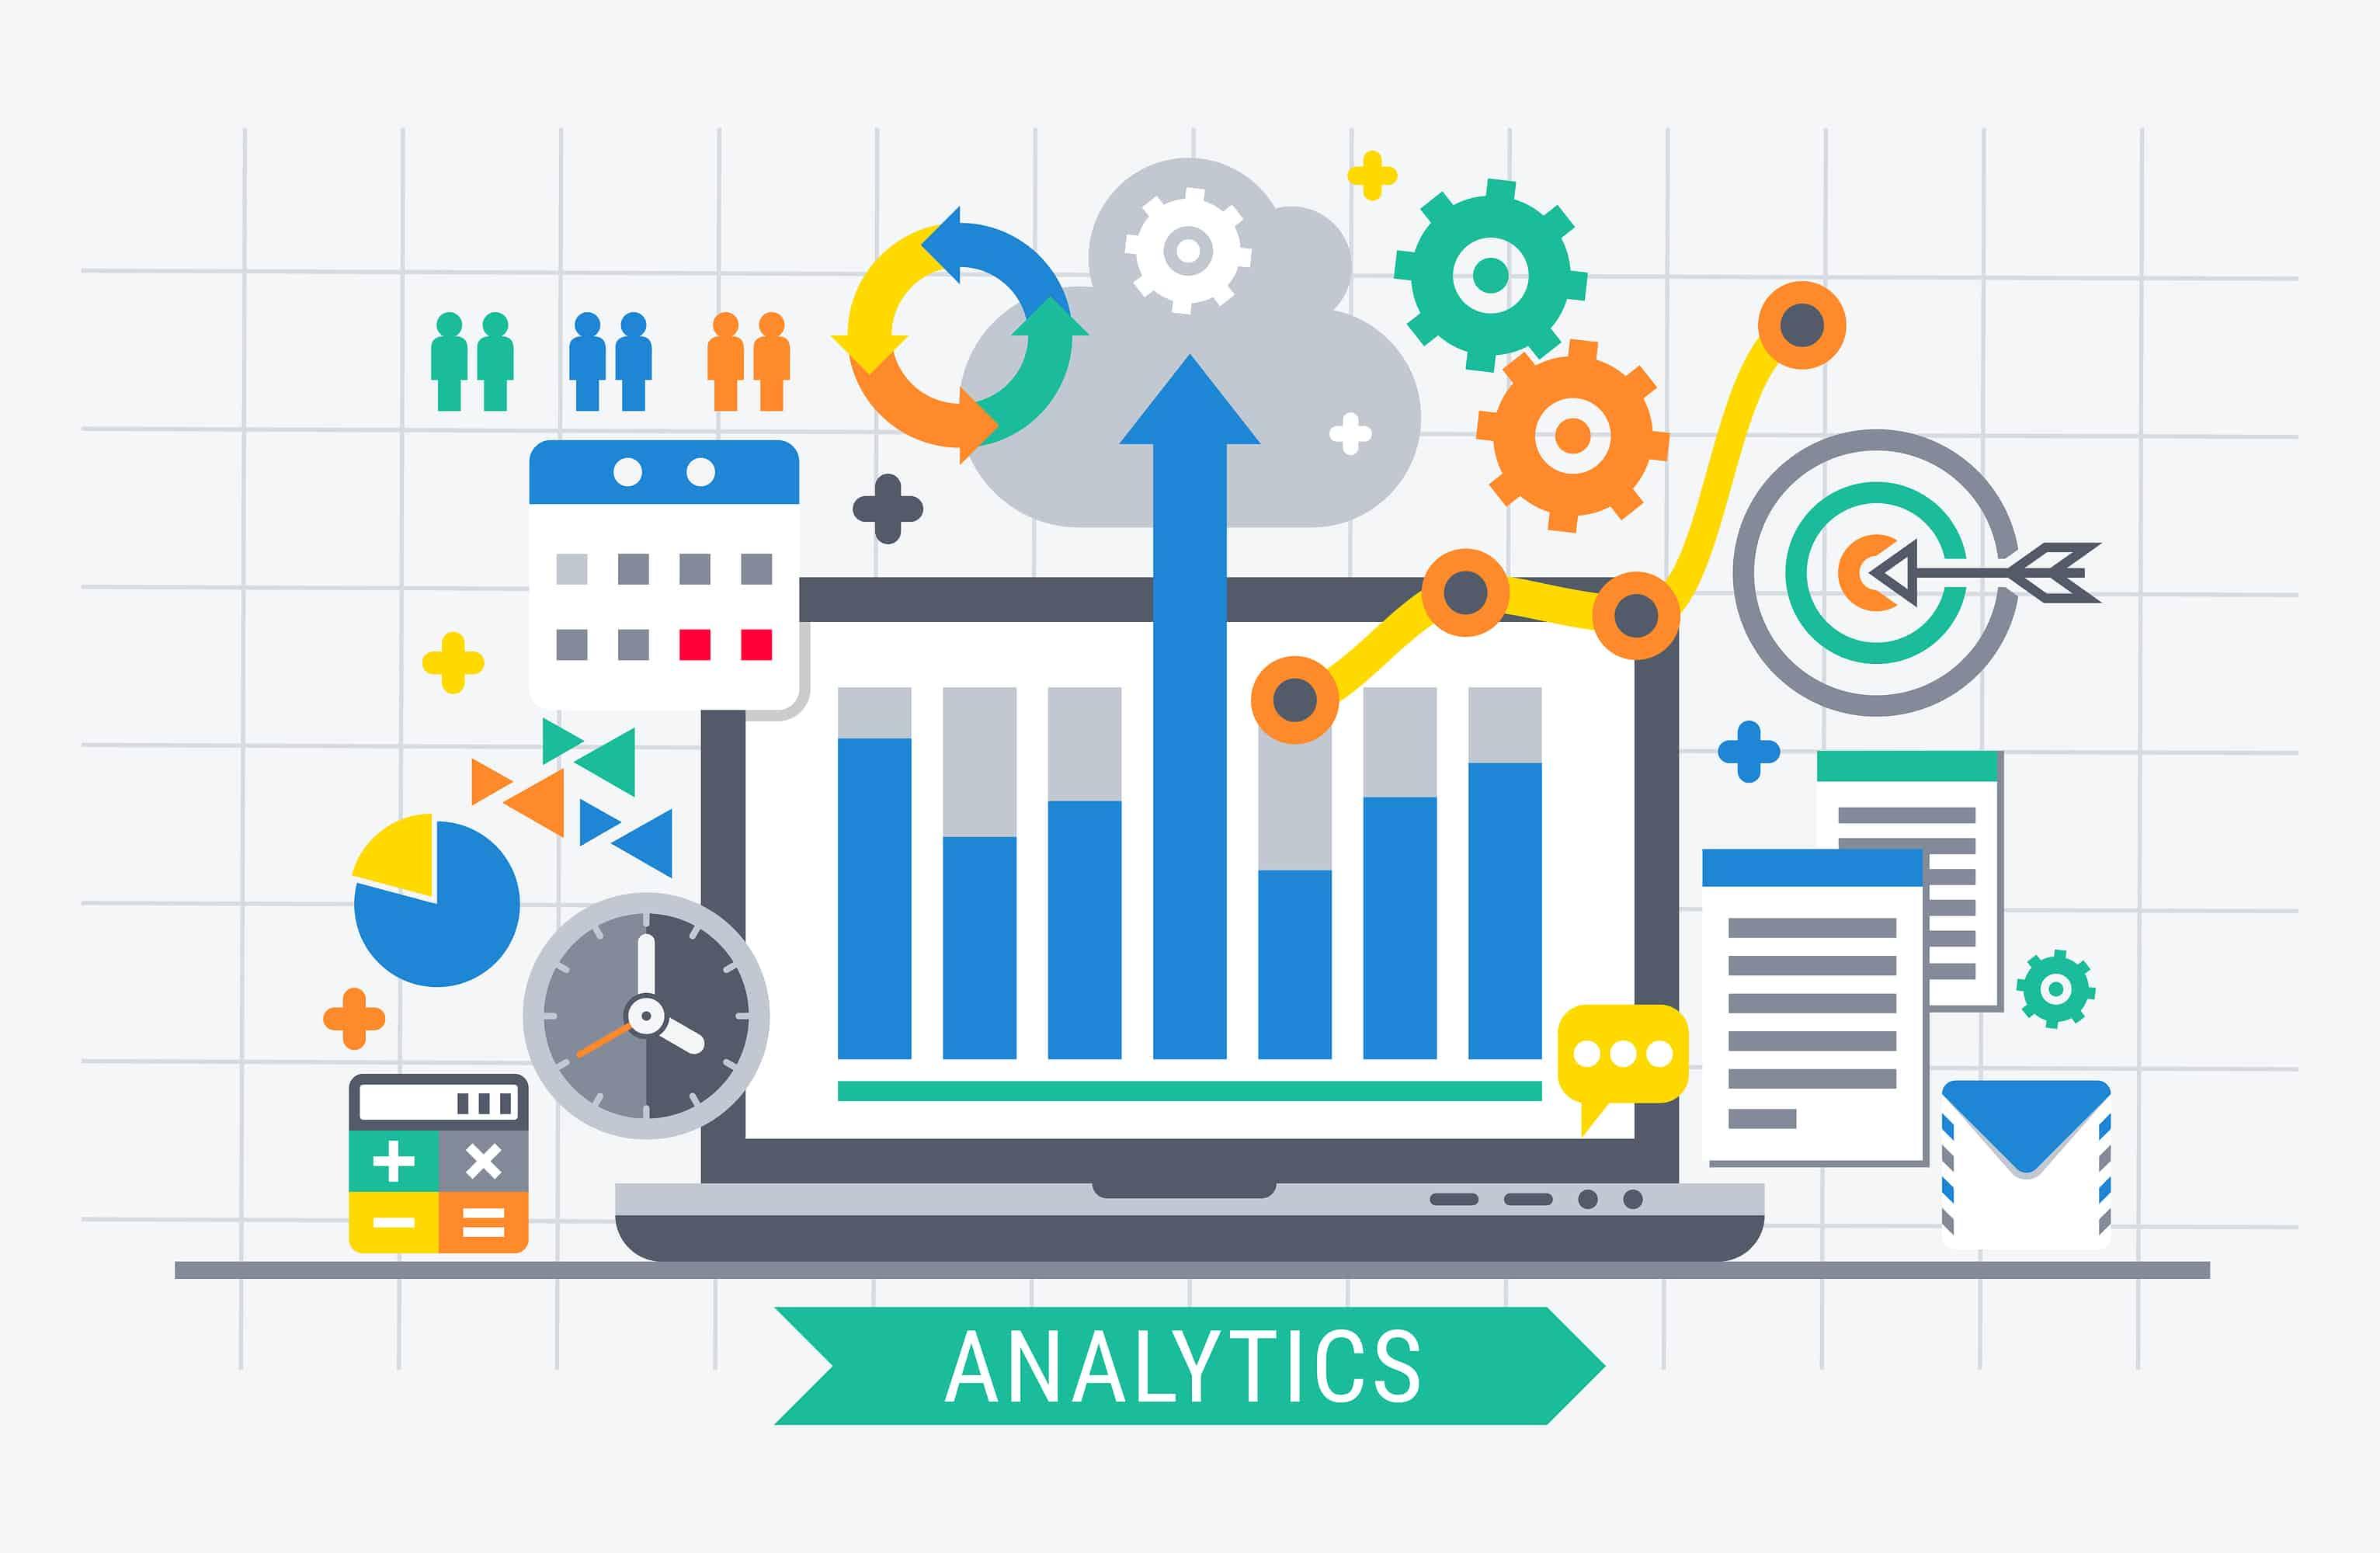 Marketing analytics is the process of analyzing marketing strategies